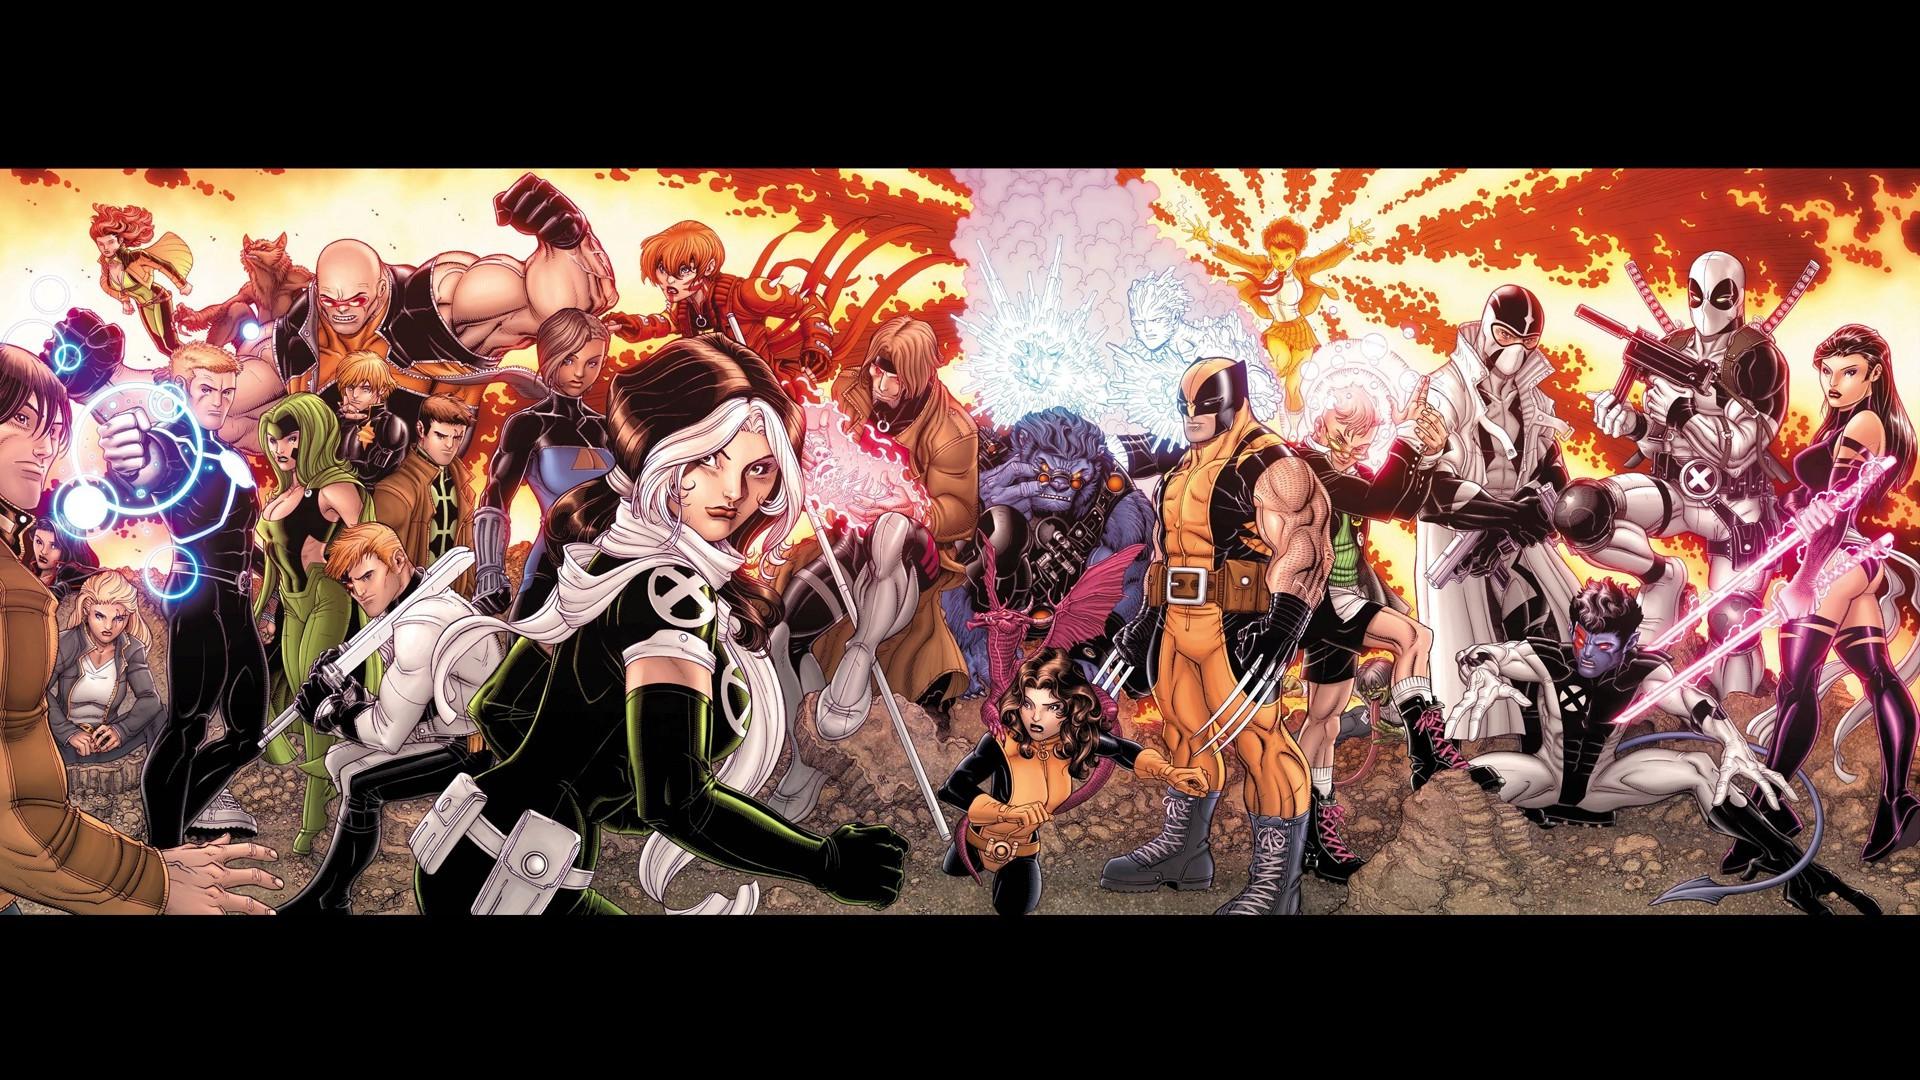 Download Wallpaper Marvel Beast - 1920x1080-px-Beast-character-comics-Deadpool-Gambit-Marvel-Comics-Rogue-Wolverine-X-Men-1101448  HD_463459.jpg